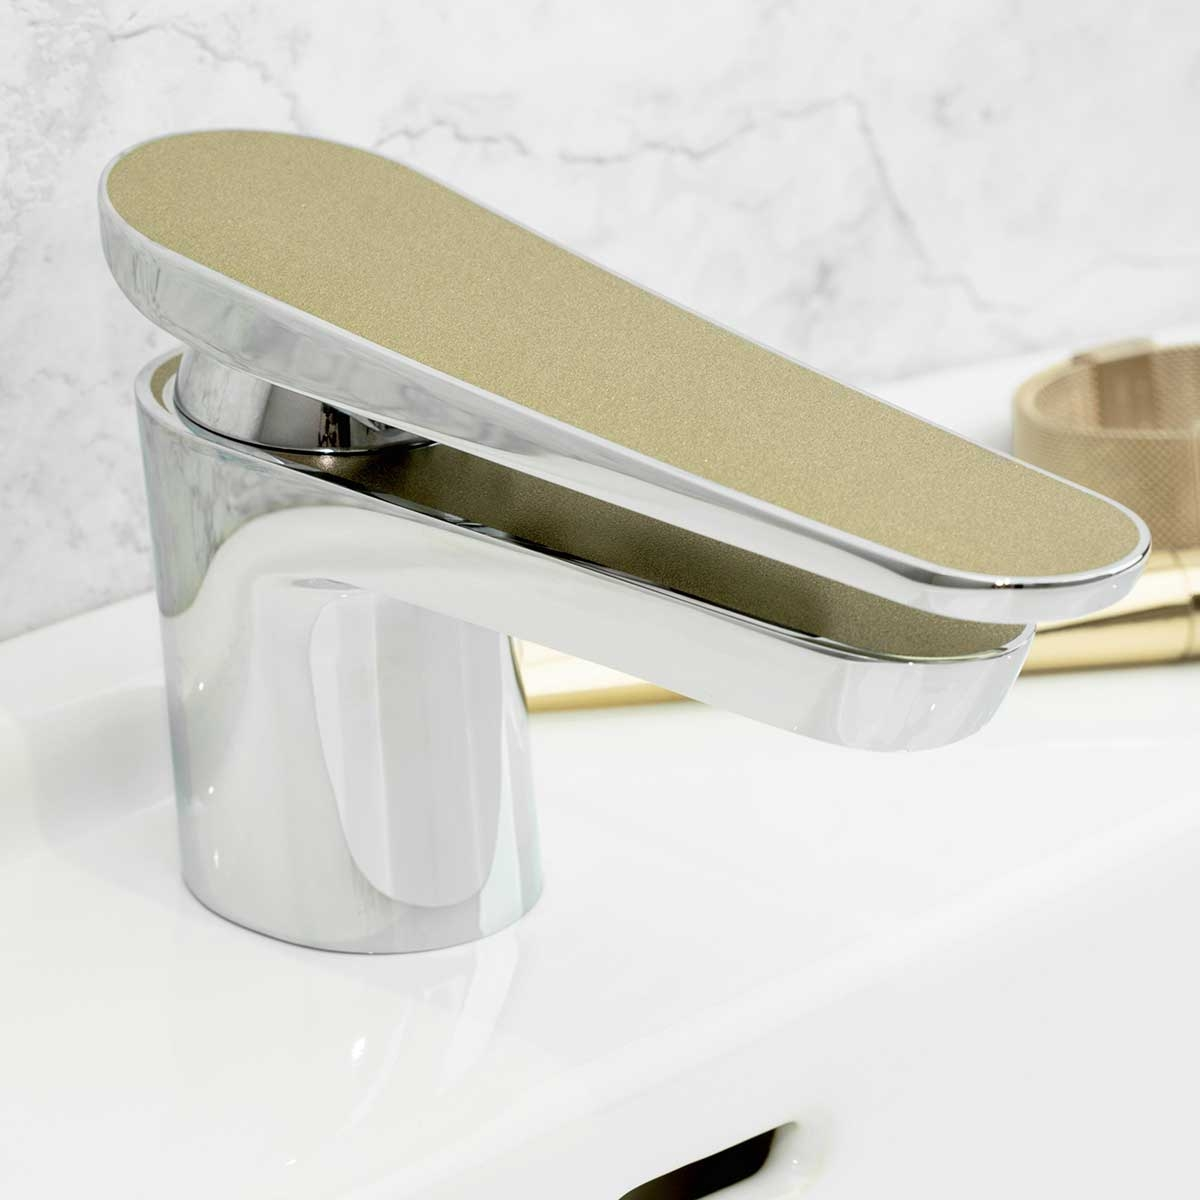 Bristan Metallix Claret Basin Mixer Tap - Champagne Shimmer